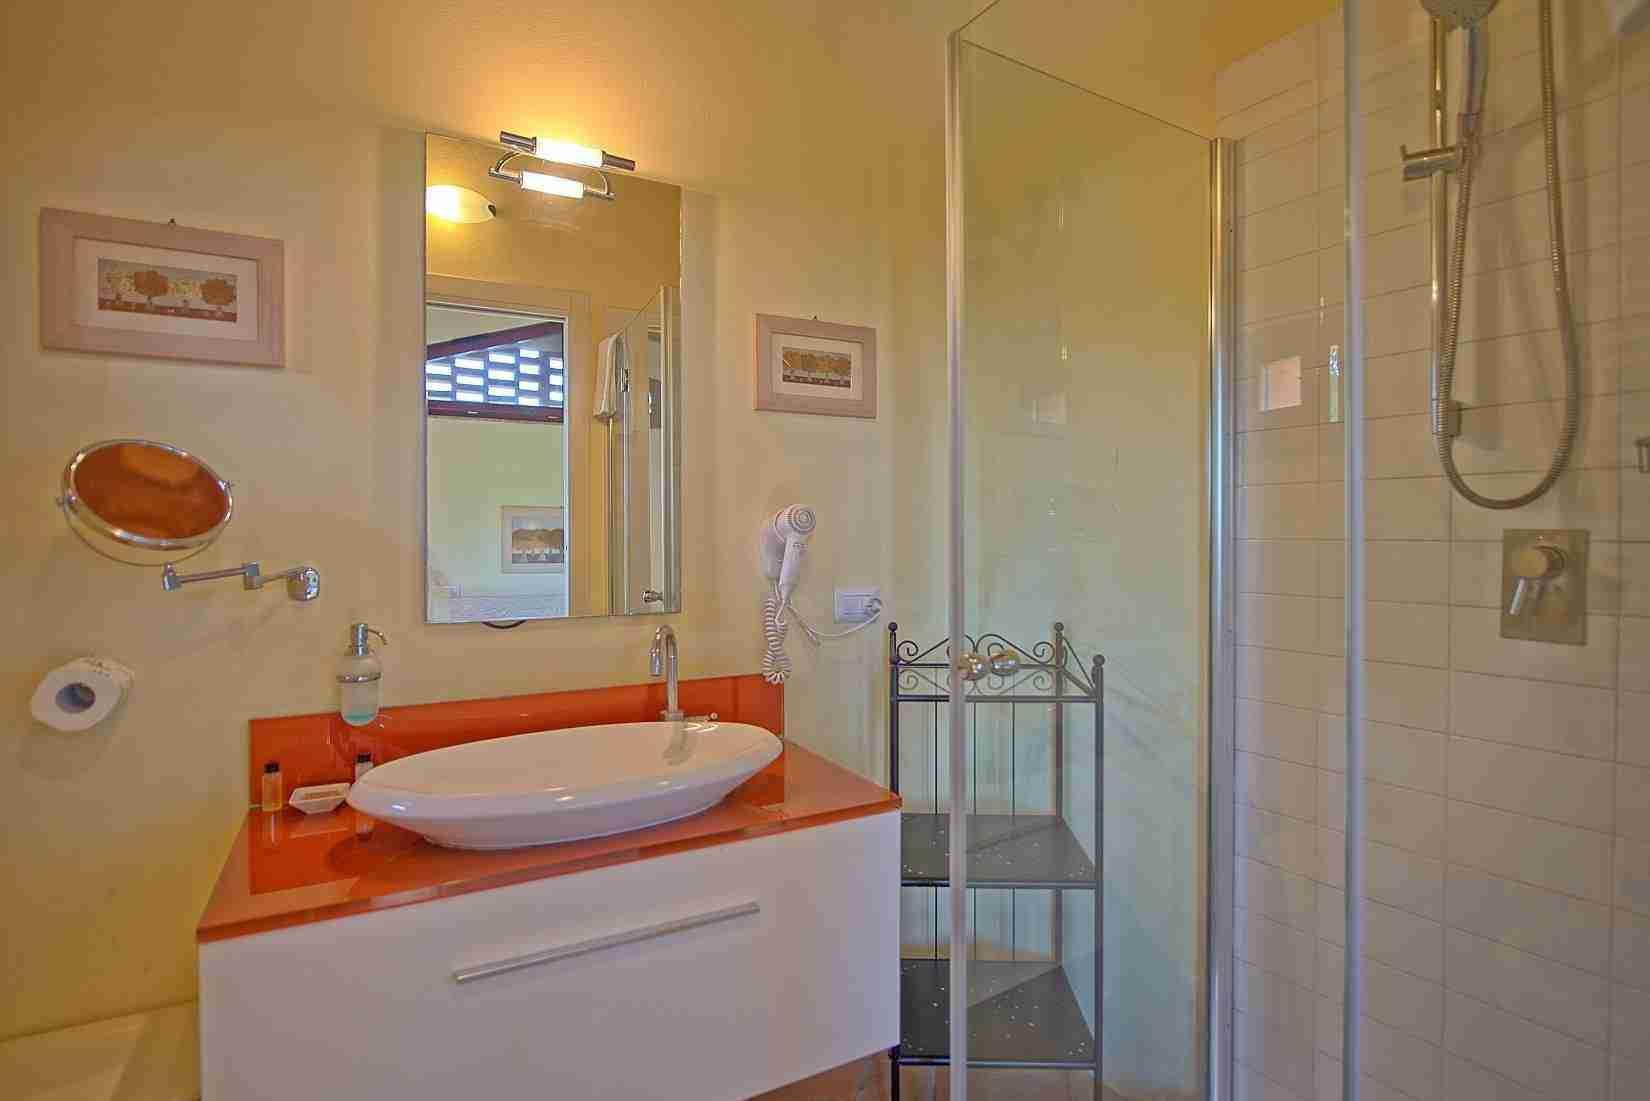 18 Ranieri bathroom